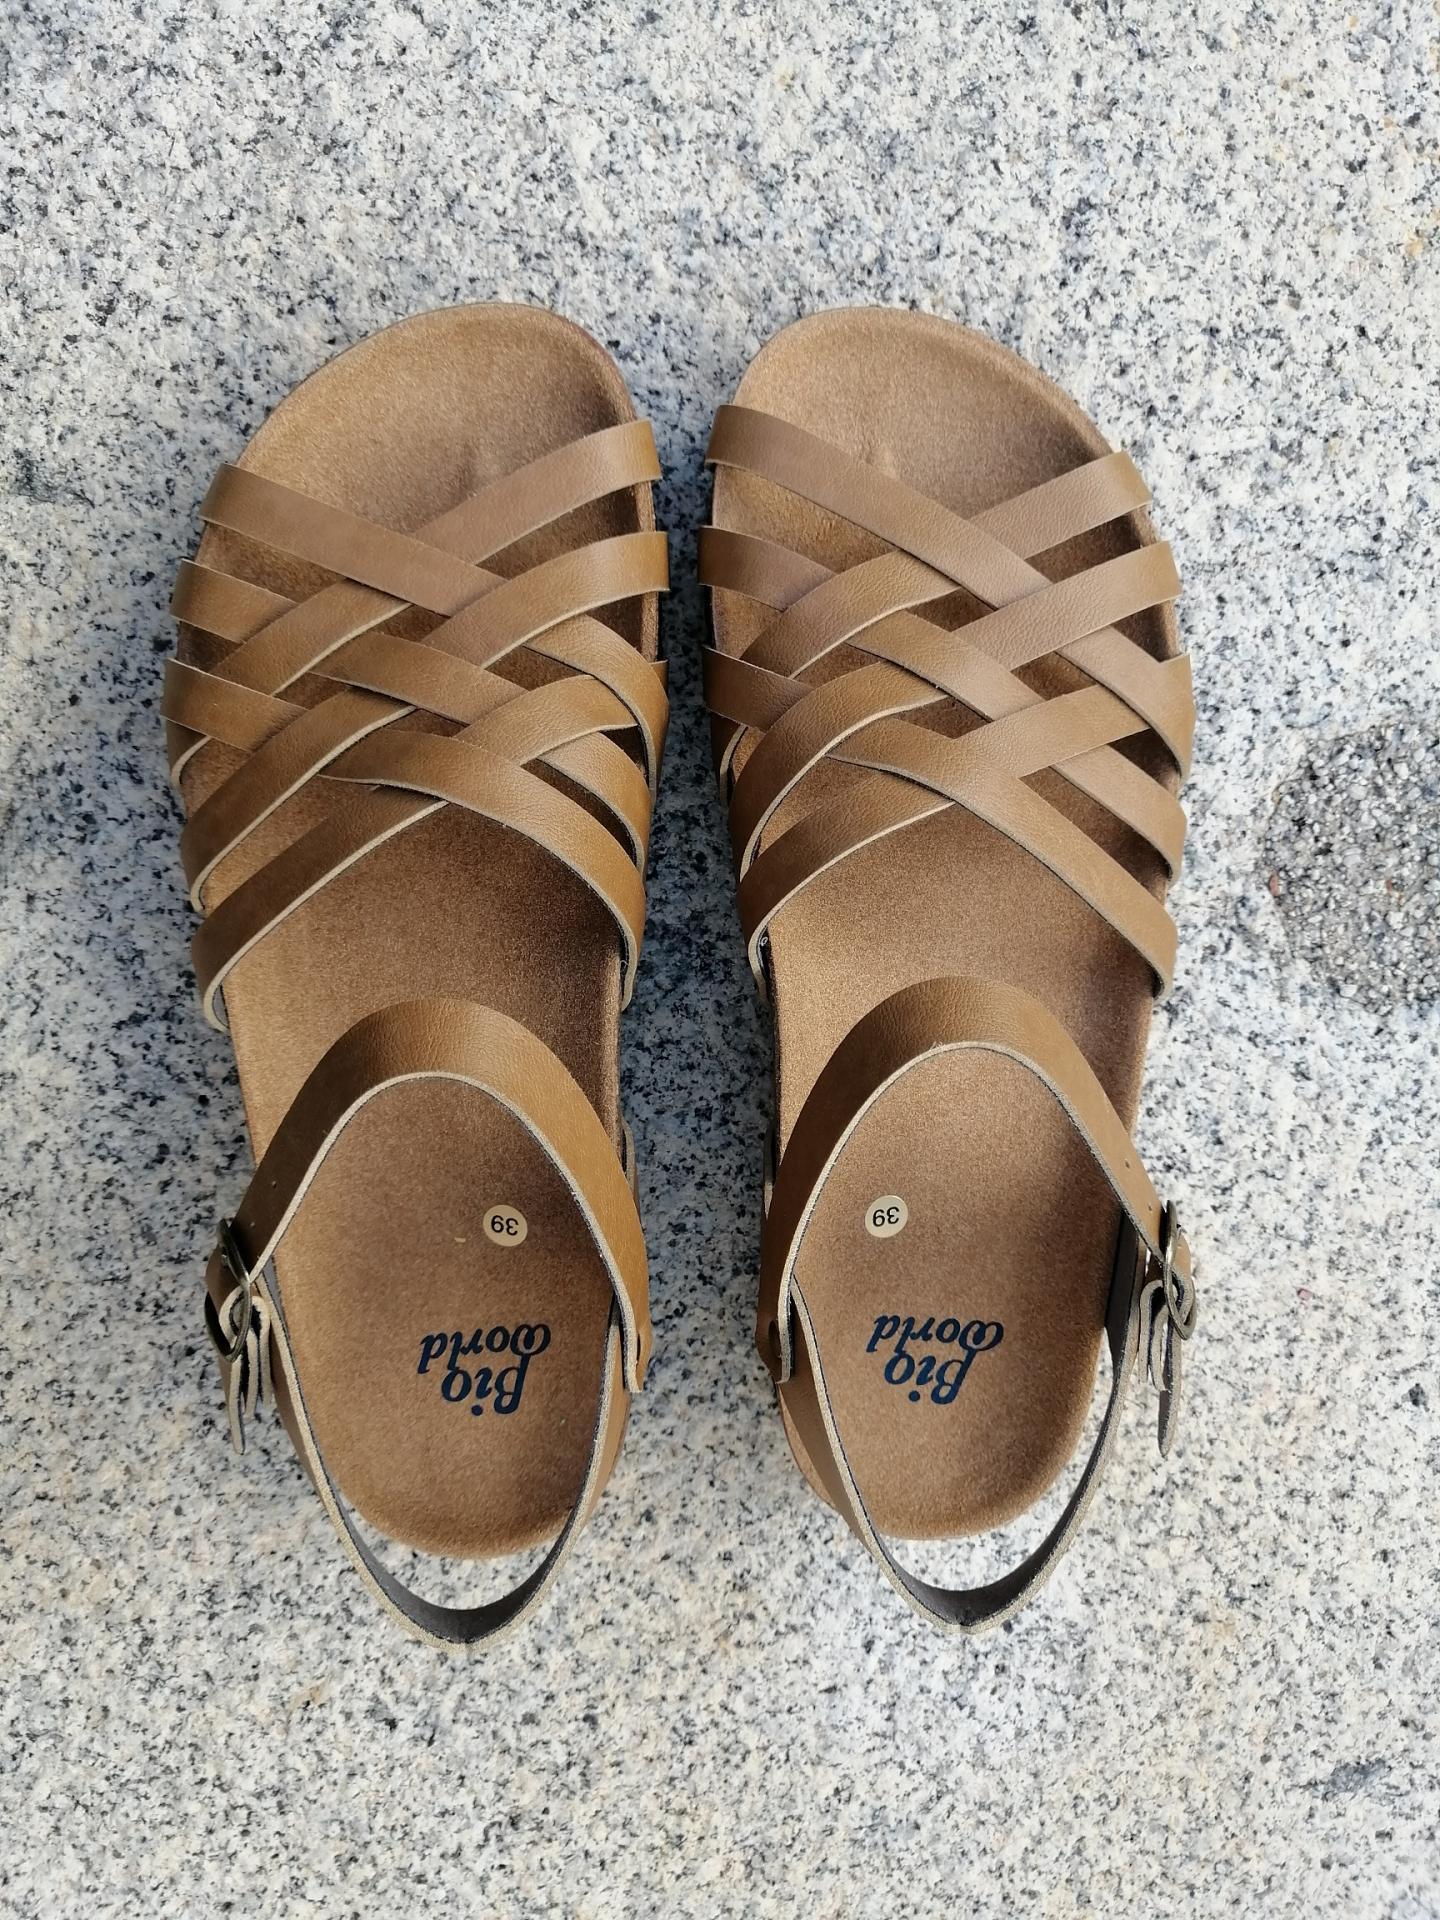 ELCANO Camel, NUEVO 2020, sandalias veganas, sandalias veganas mujer, calzado vegano, sandalias de tacón bajo, sandalias bioworld, vegan shoes, sandalias color camel.